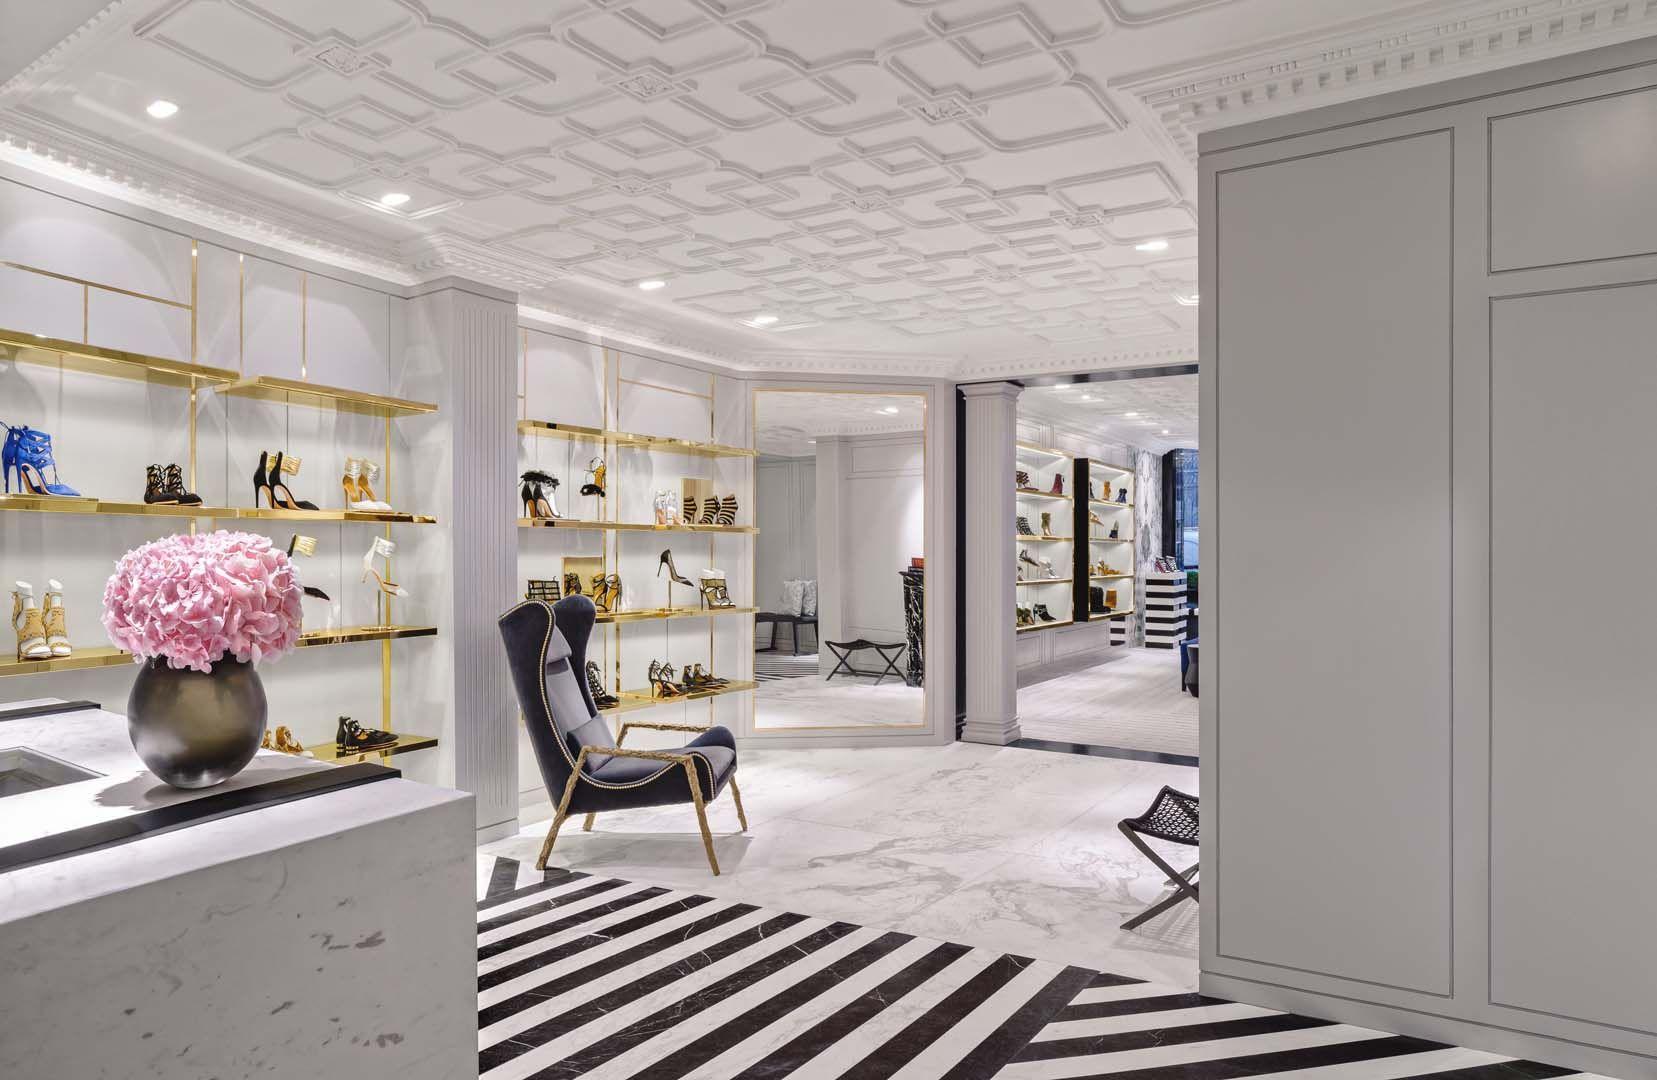 Aquazzura Store In London Mayfair With Interior Design And Architecture Of Casa Do Passadio Black